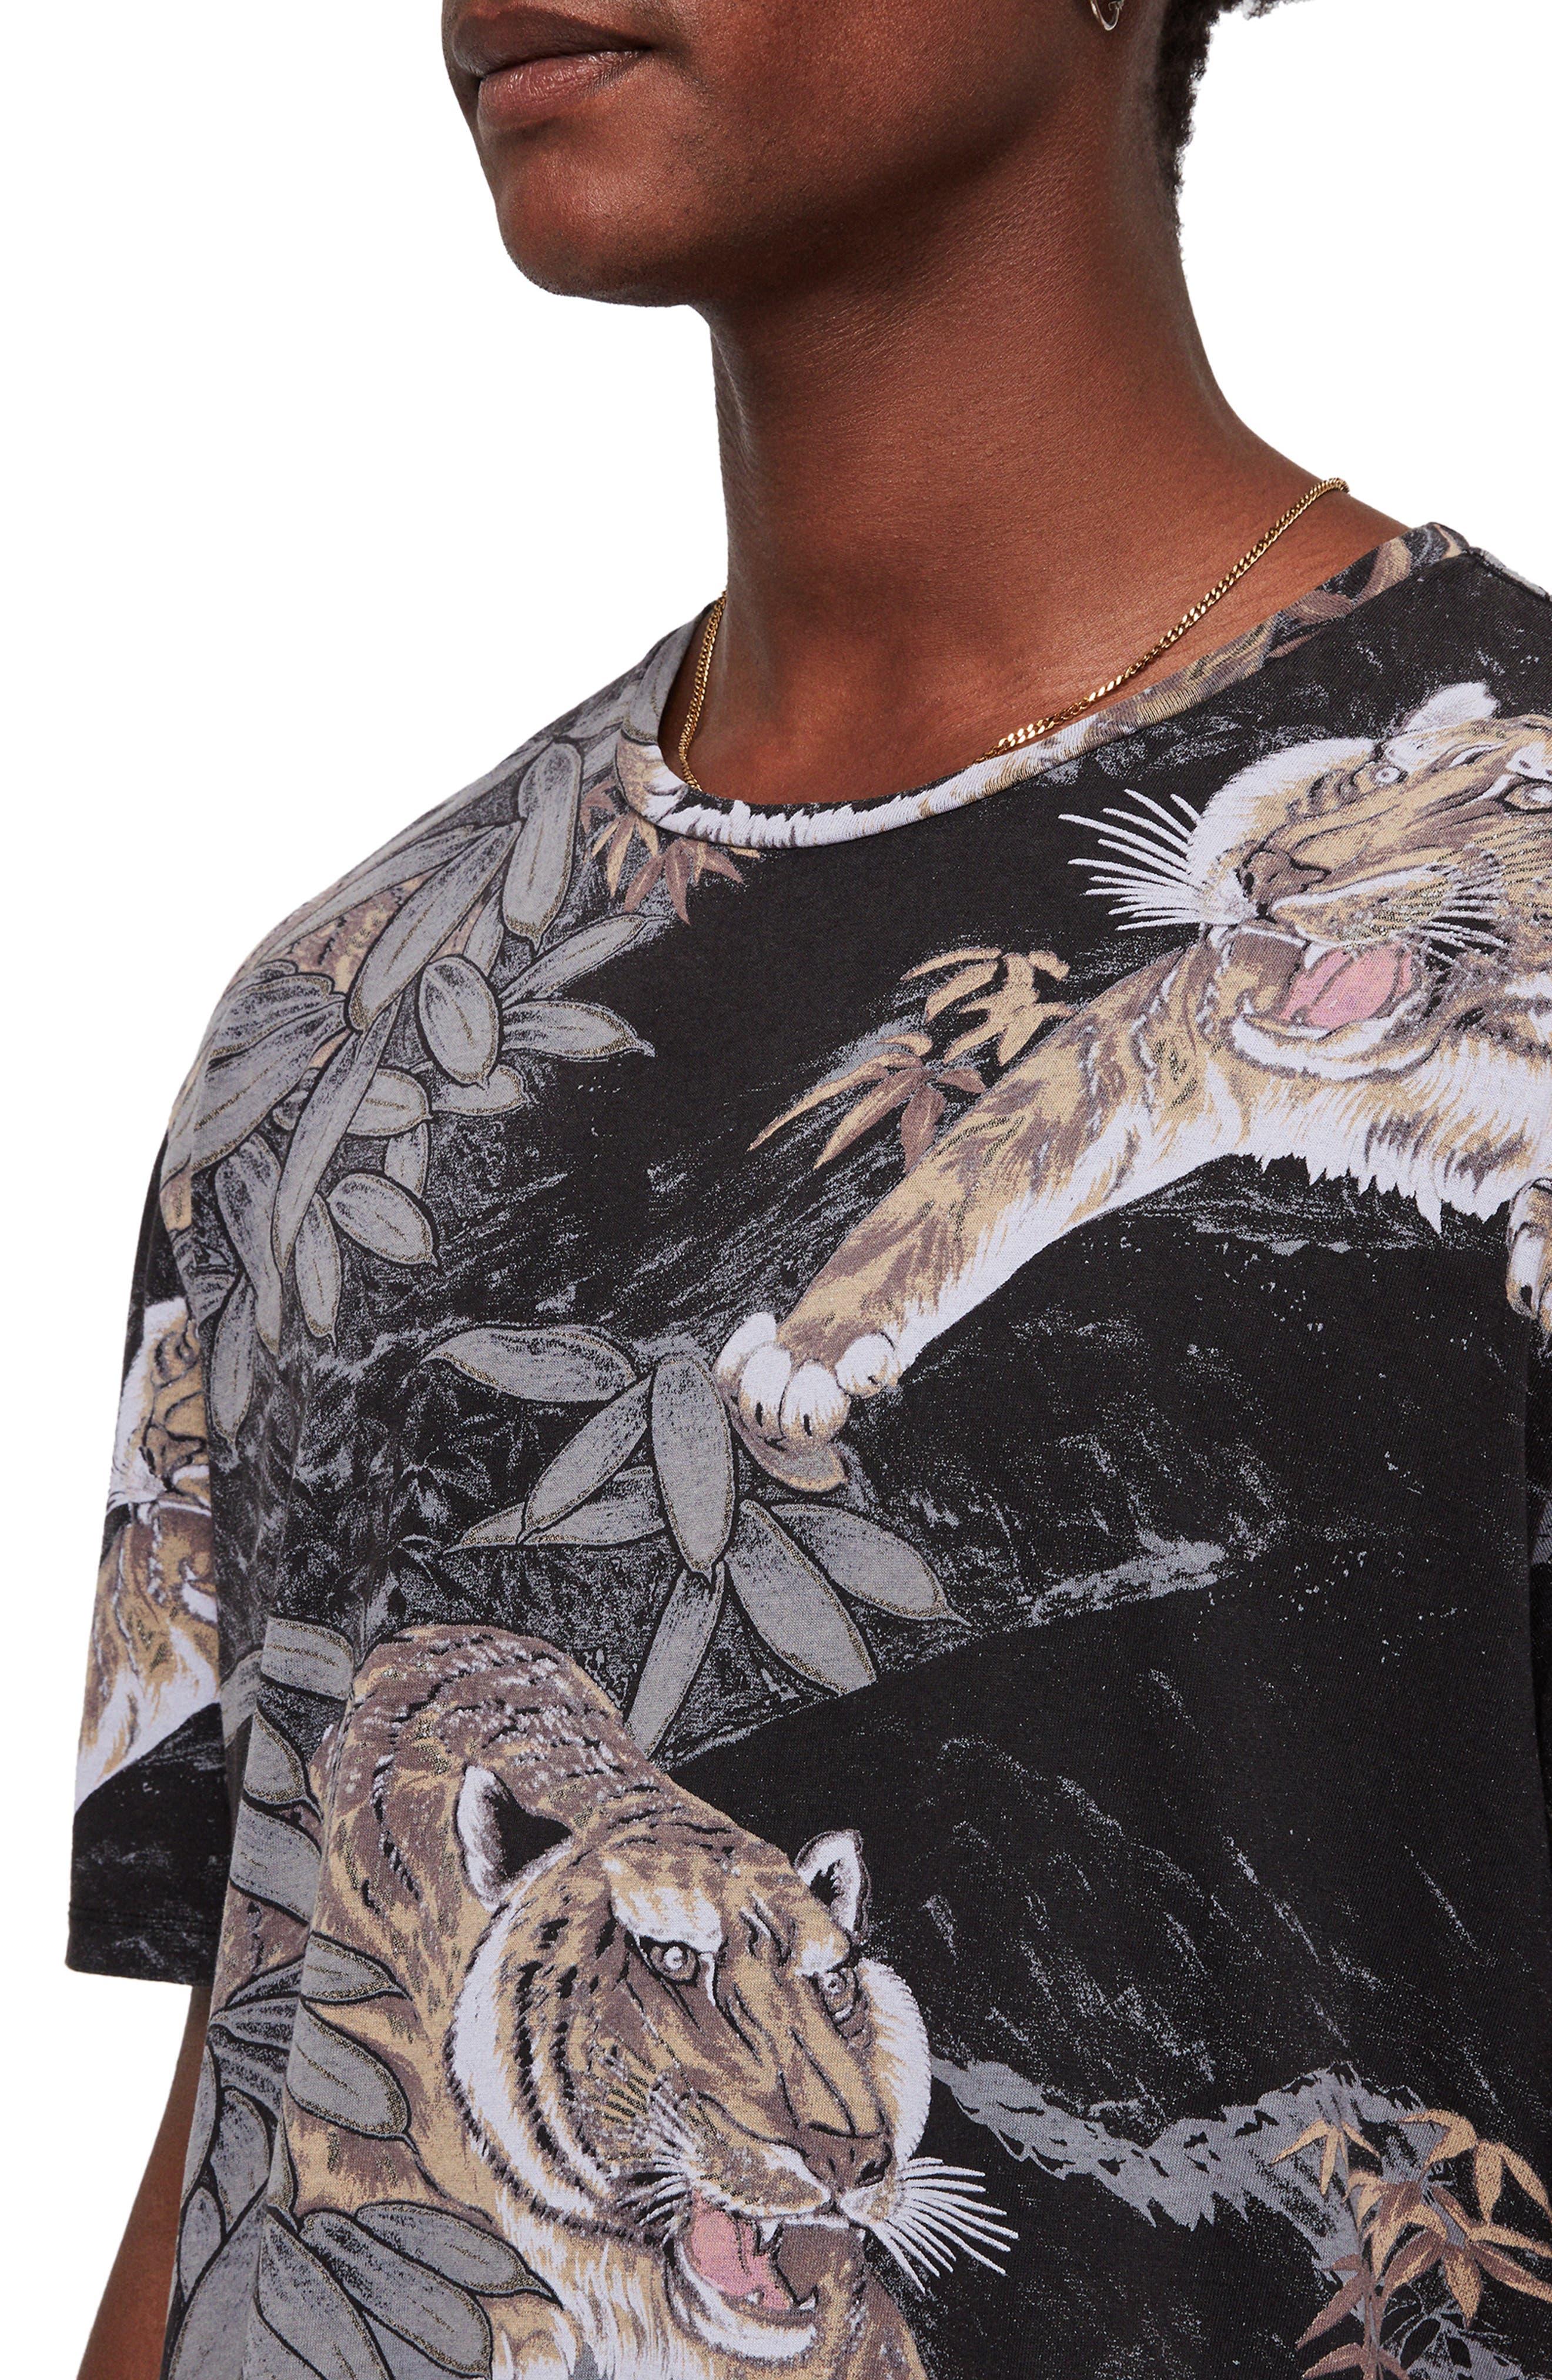 Chokai Slim Fit T-Shirt,                             Alternate thumbnail 4, color,                             VINTAGE BLACK